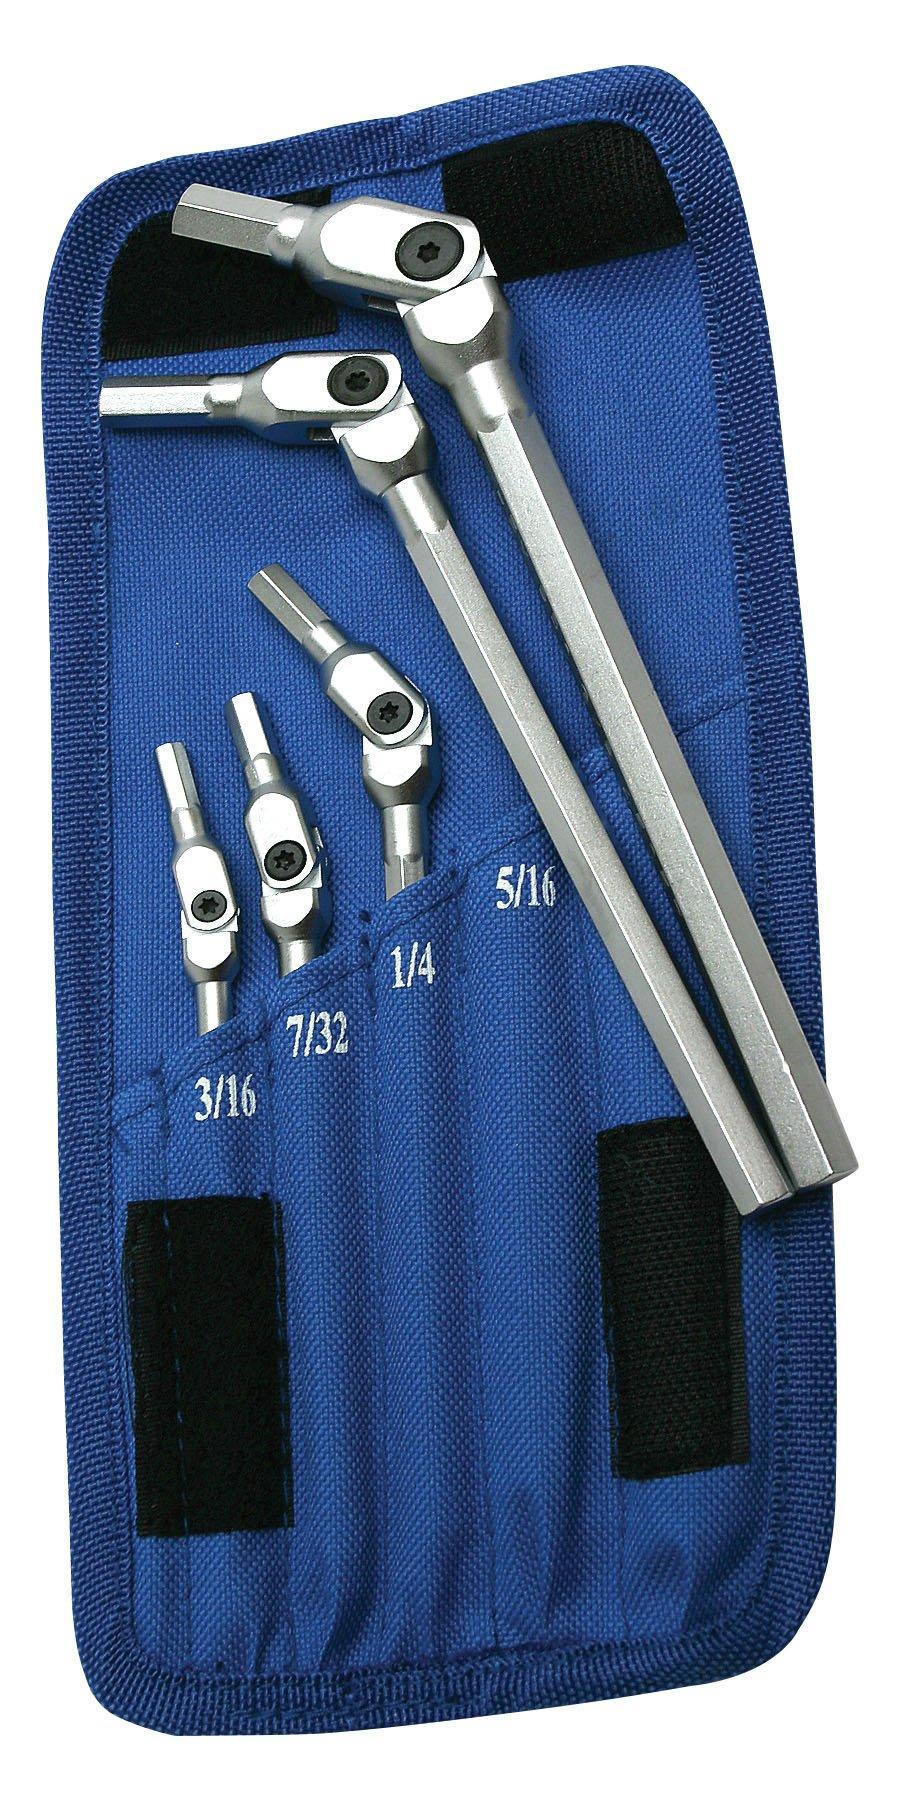 Motion Pro 08-0419 Chrome SAE Hex Wrench Set